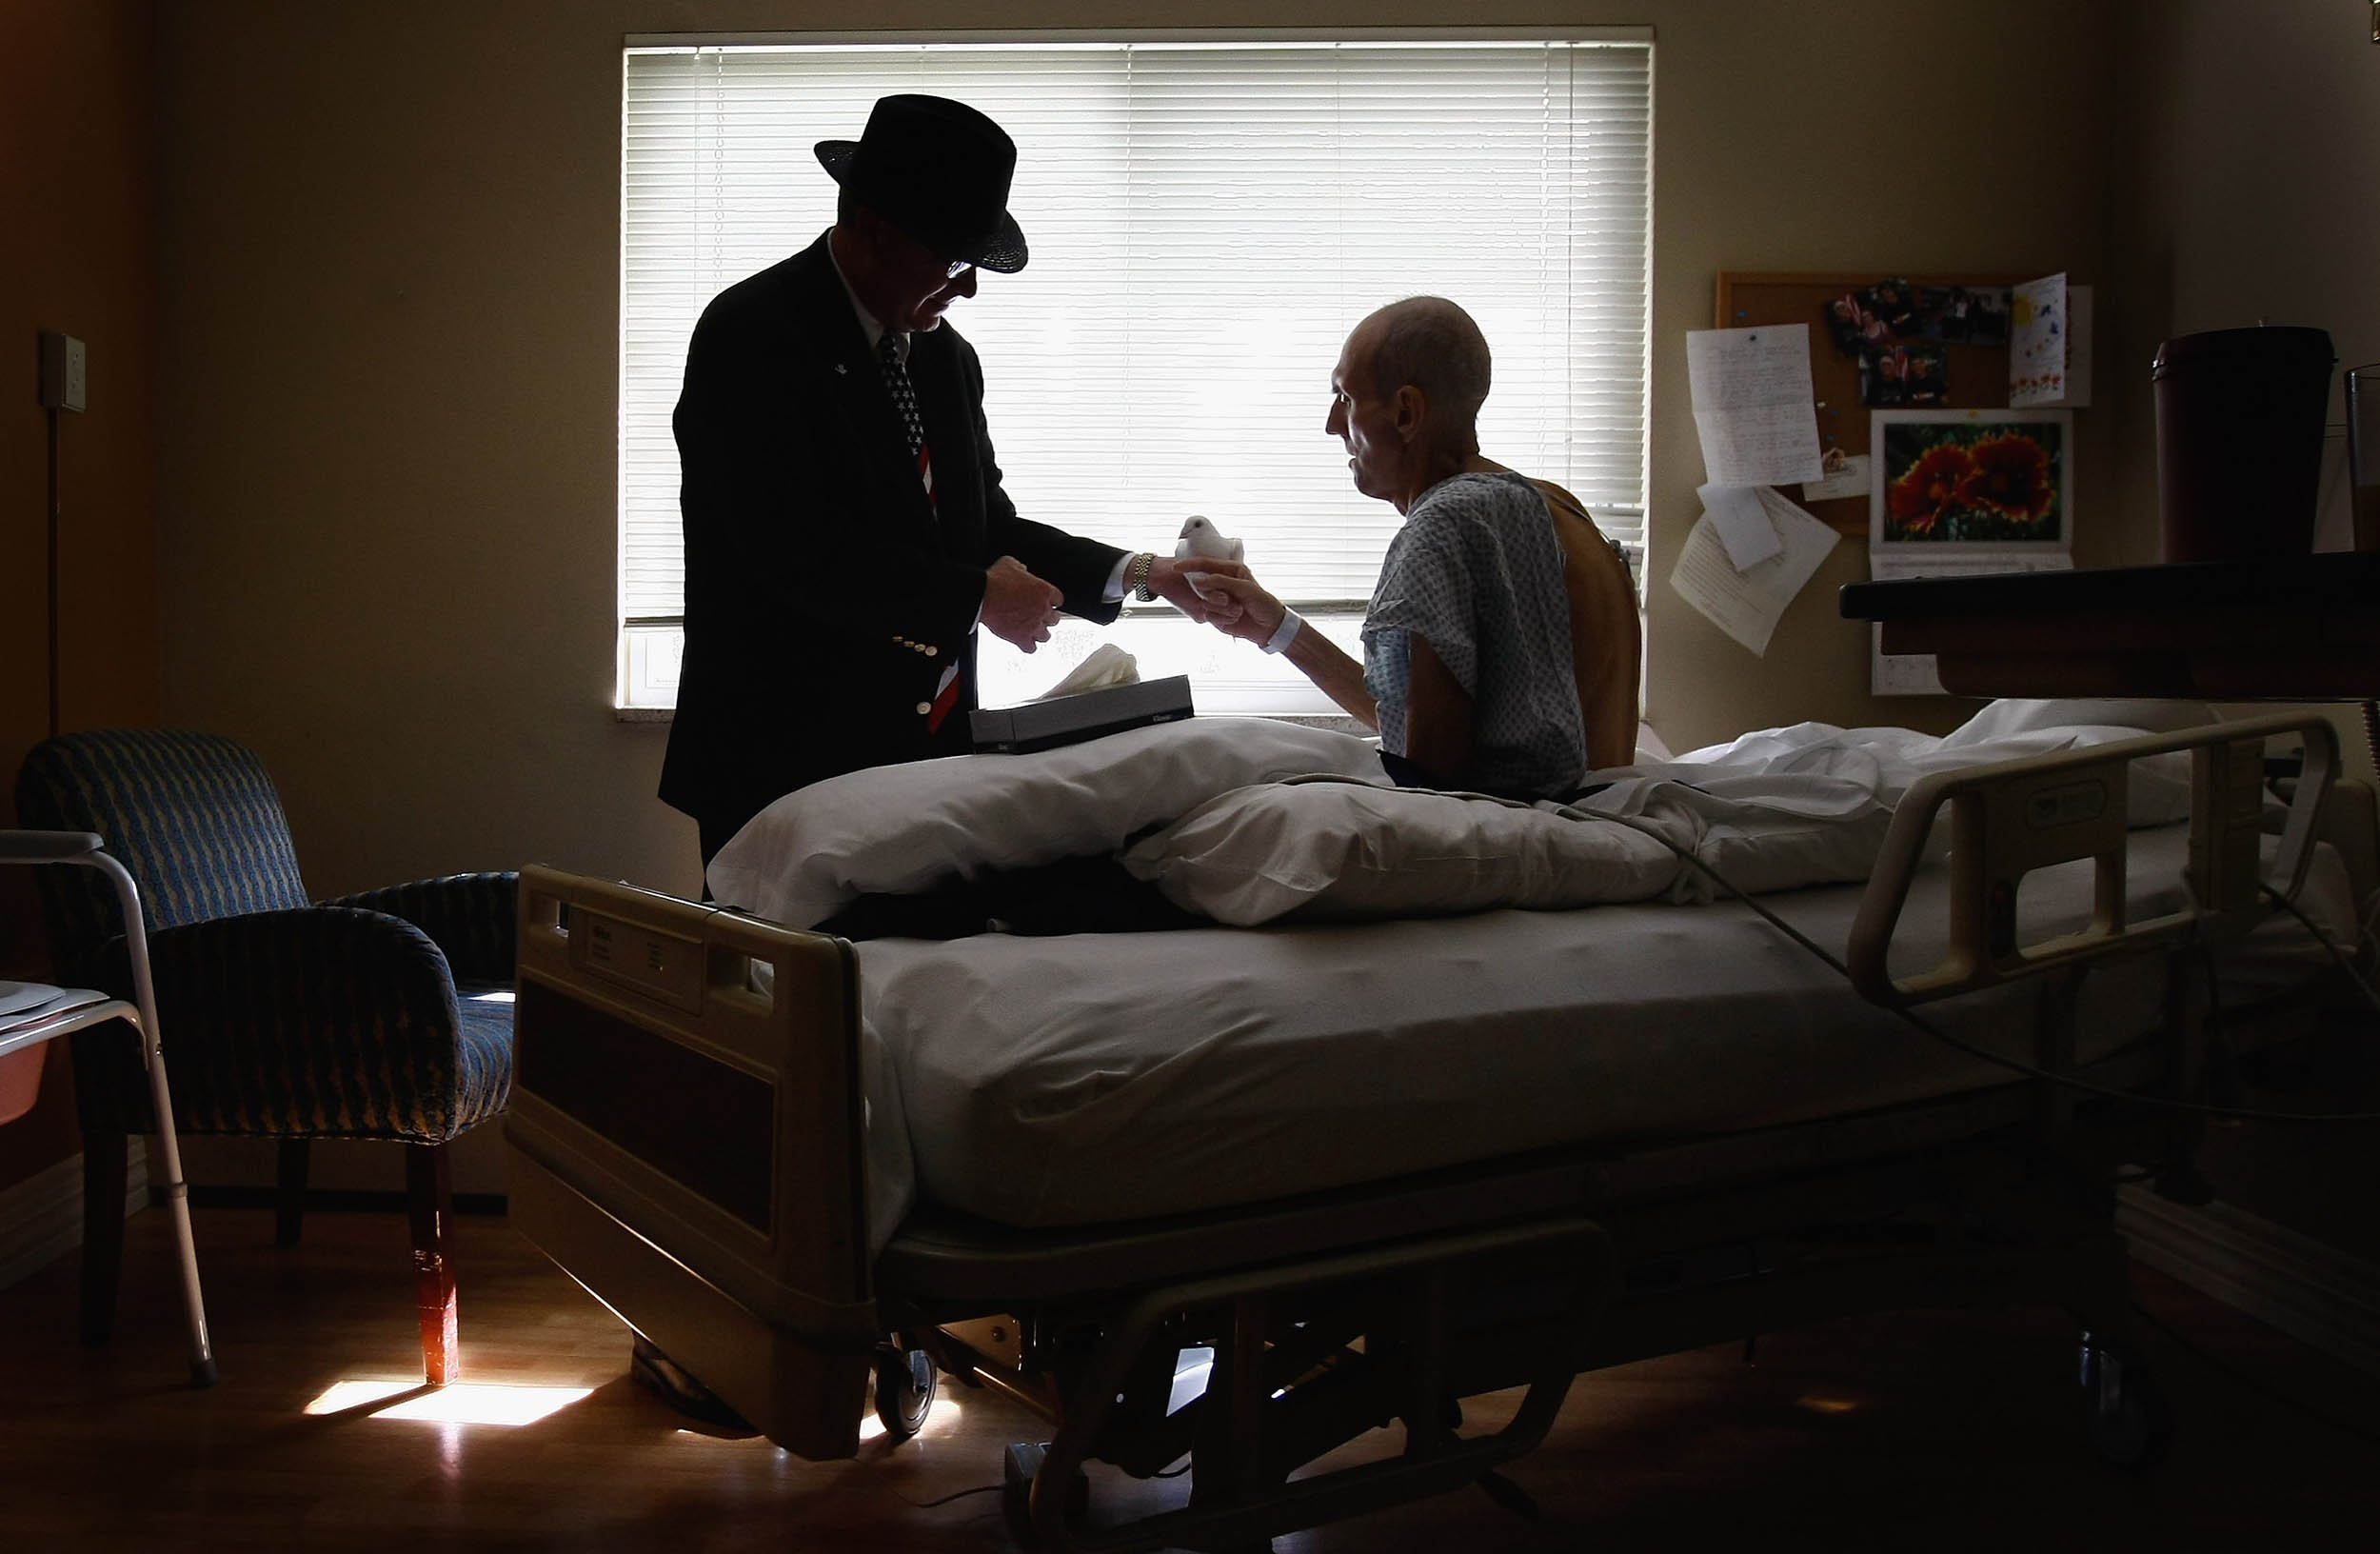 09_19_Hospice